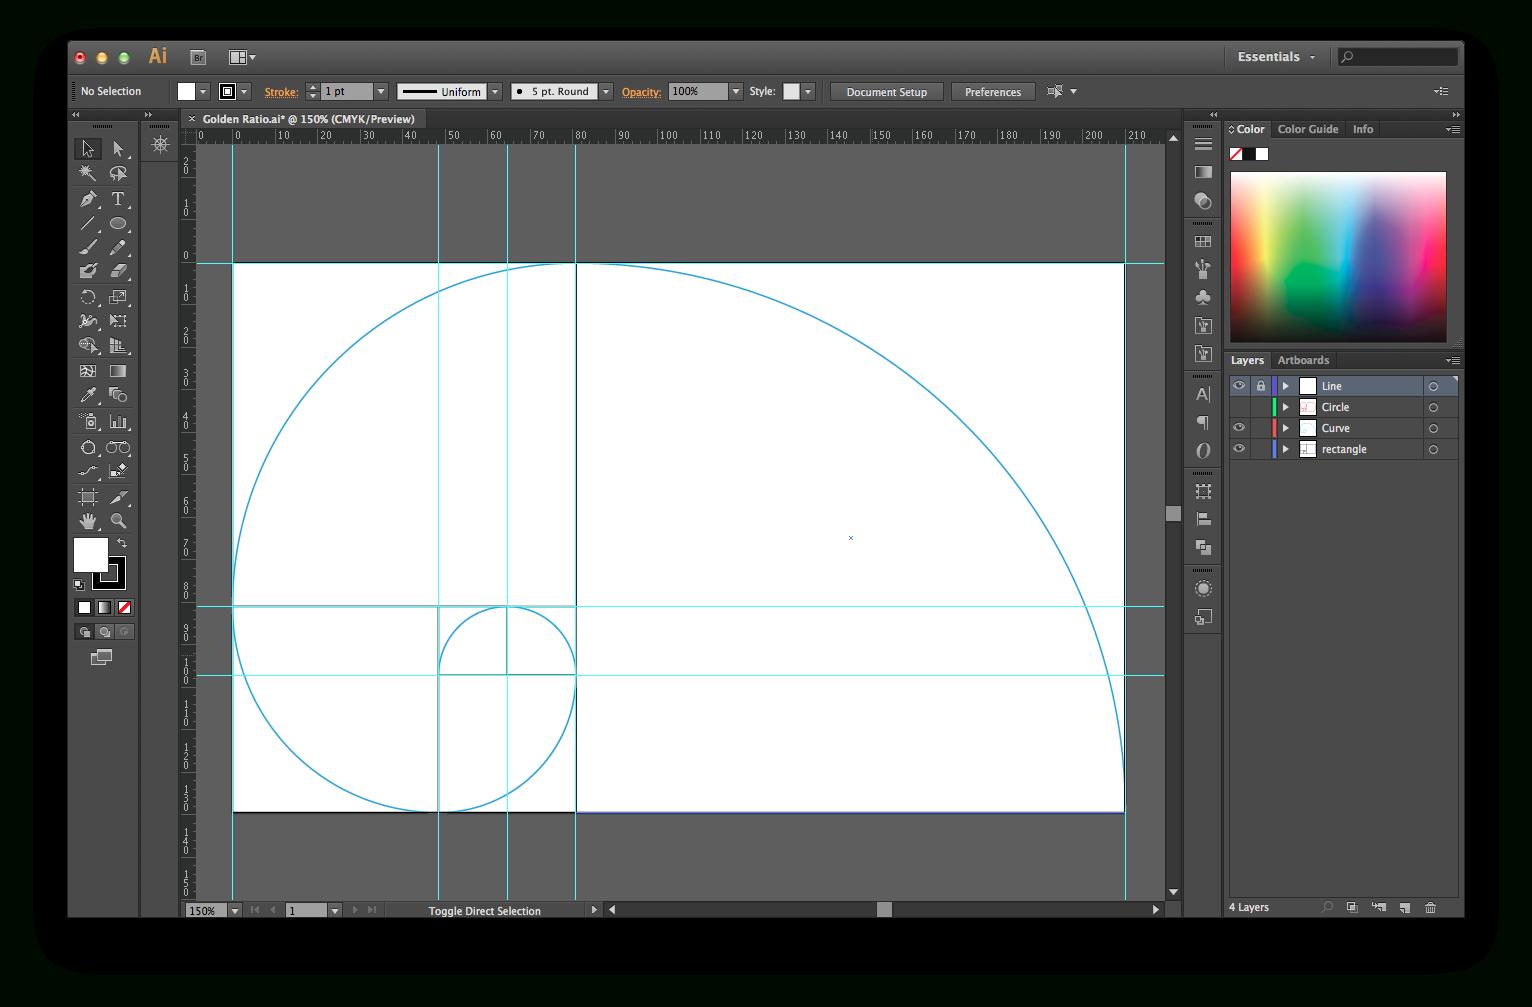 Golden Ratio Illustrator Template | Golden Ratio, Templates